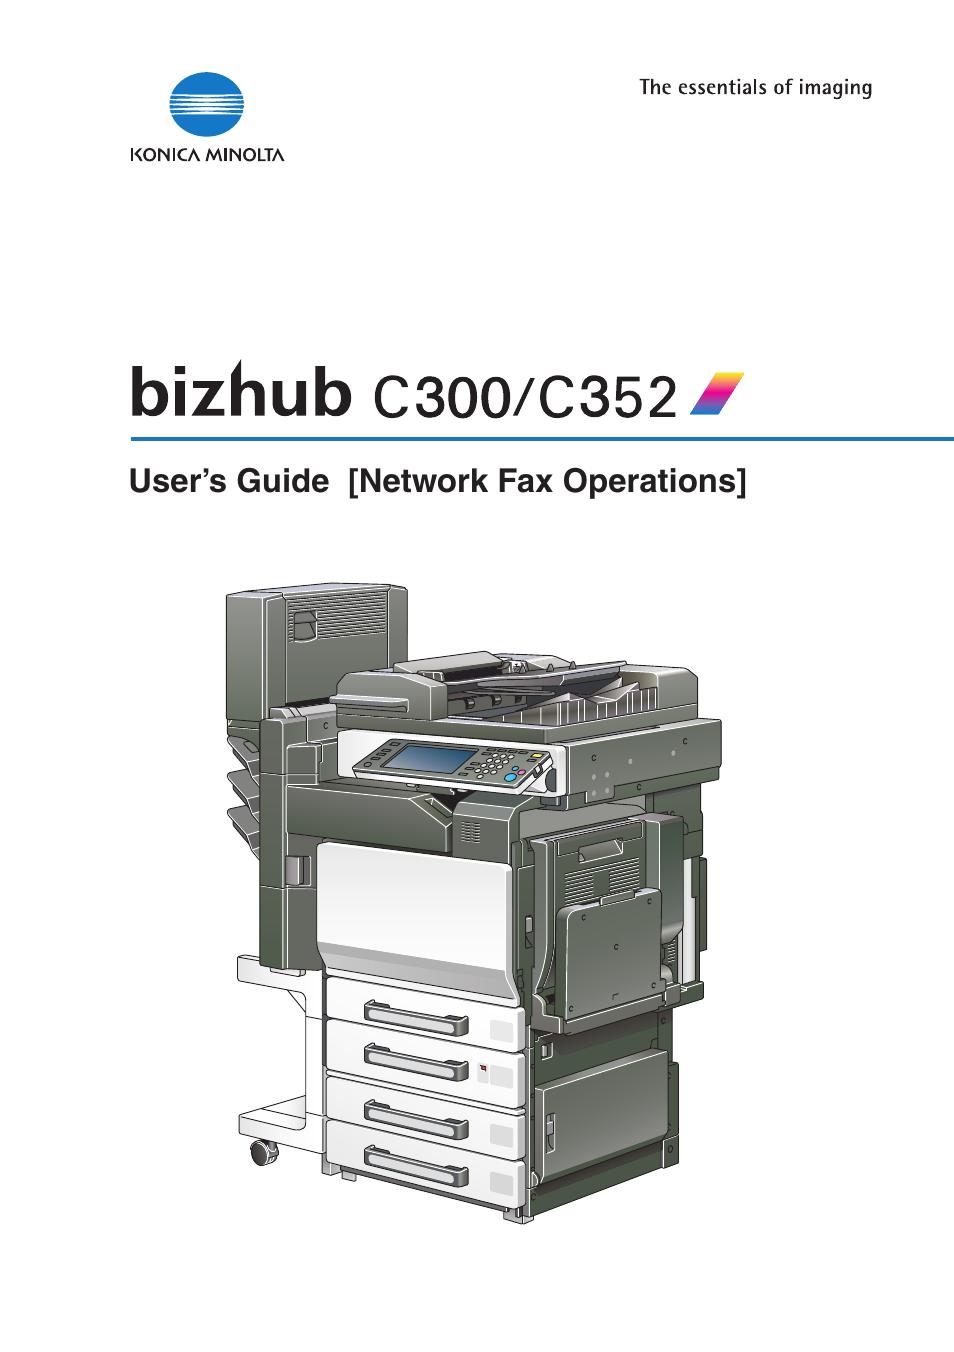 bizhub c300 manual product user guide instruction u2022 rh testdpc co Konica Minolta Bizhub 200 Copier Konica Minolta Bizhub 421 Brochure